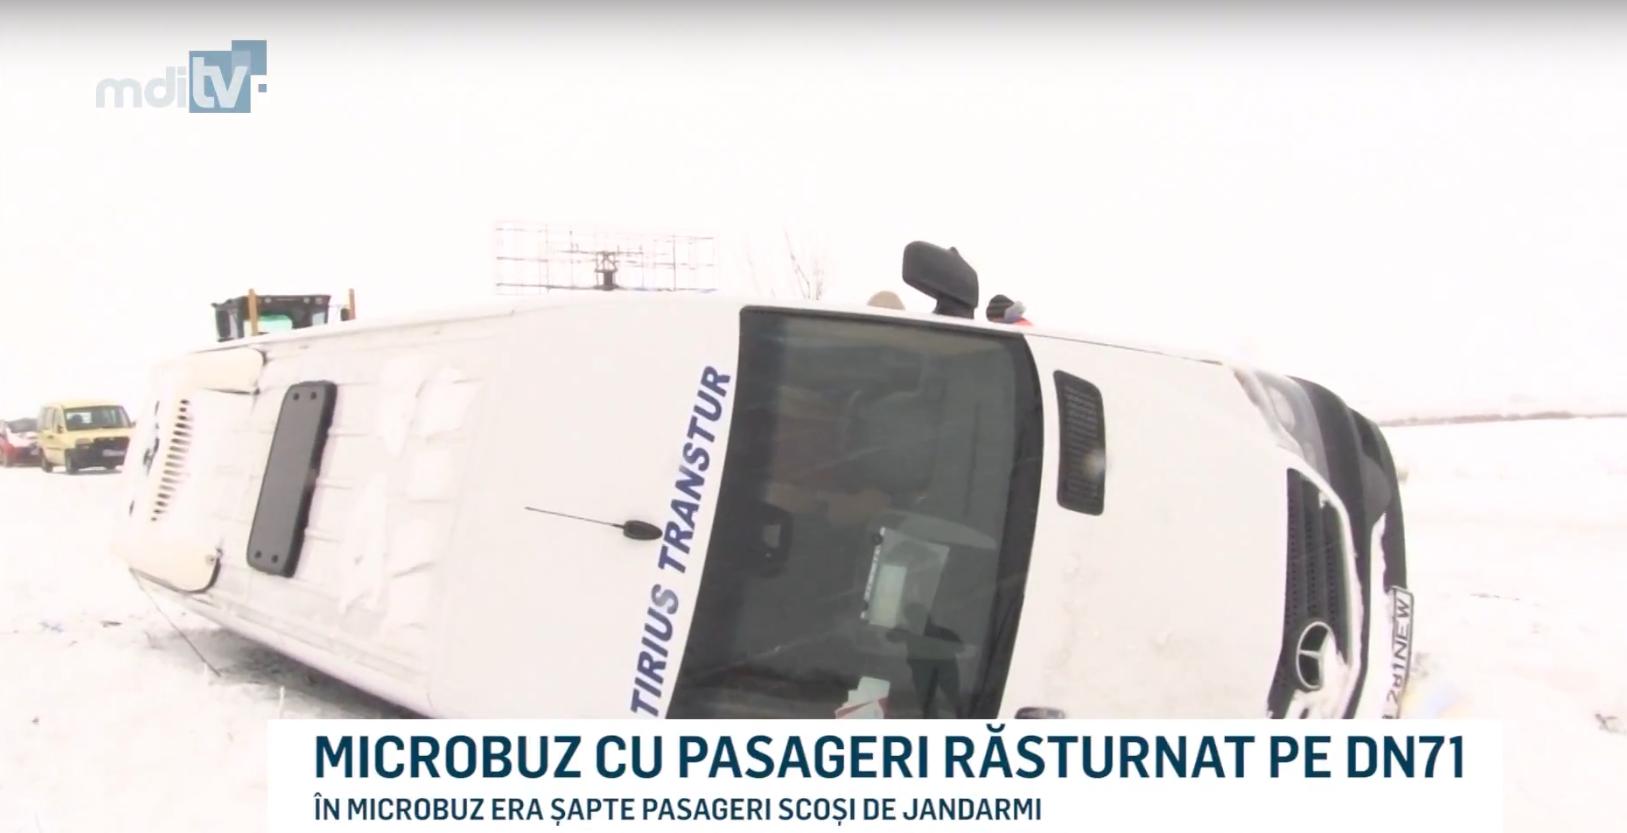 MICROBUZ CU PASAGERI RĂSTURNAT PE DN71